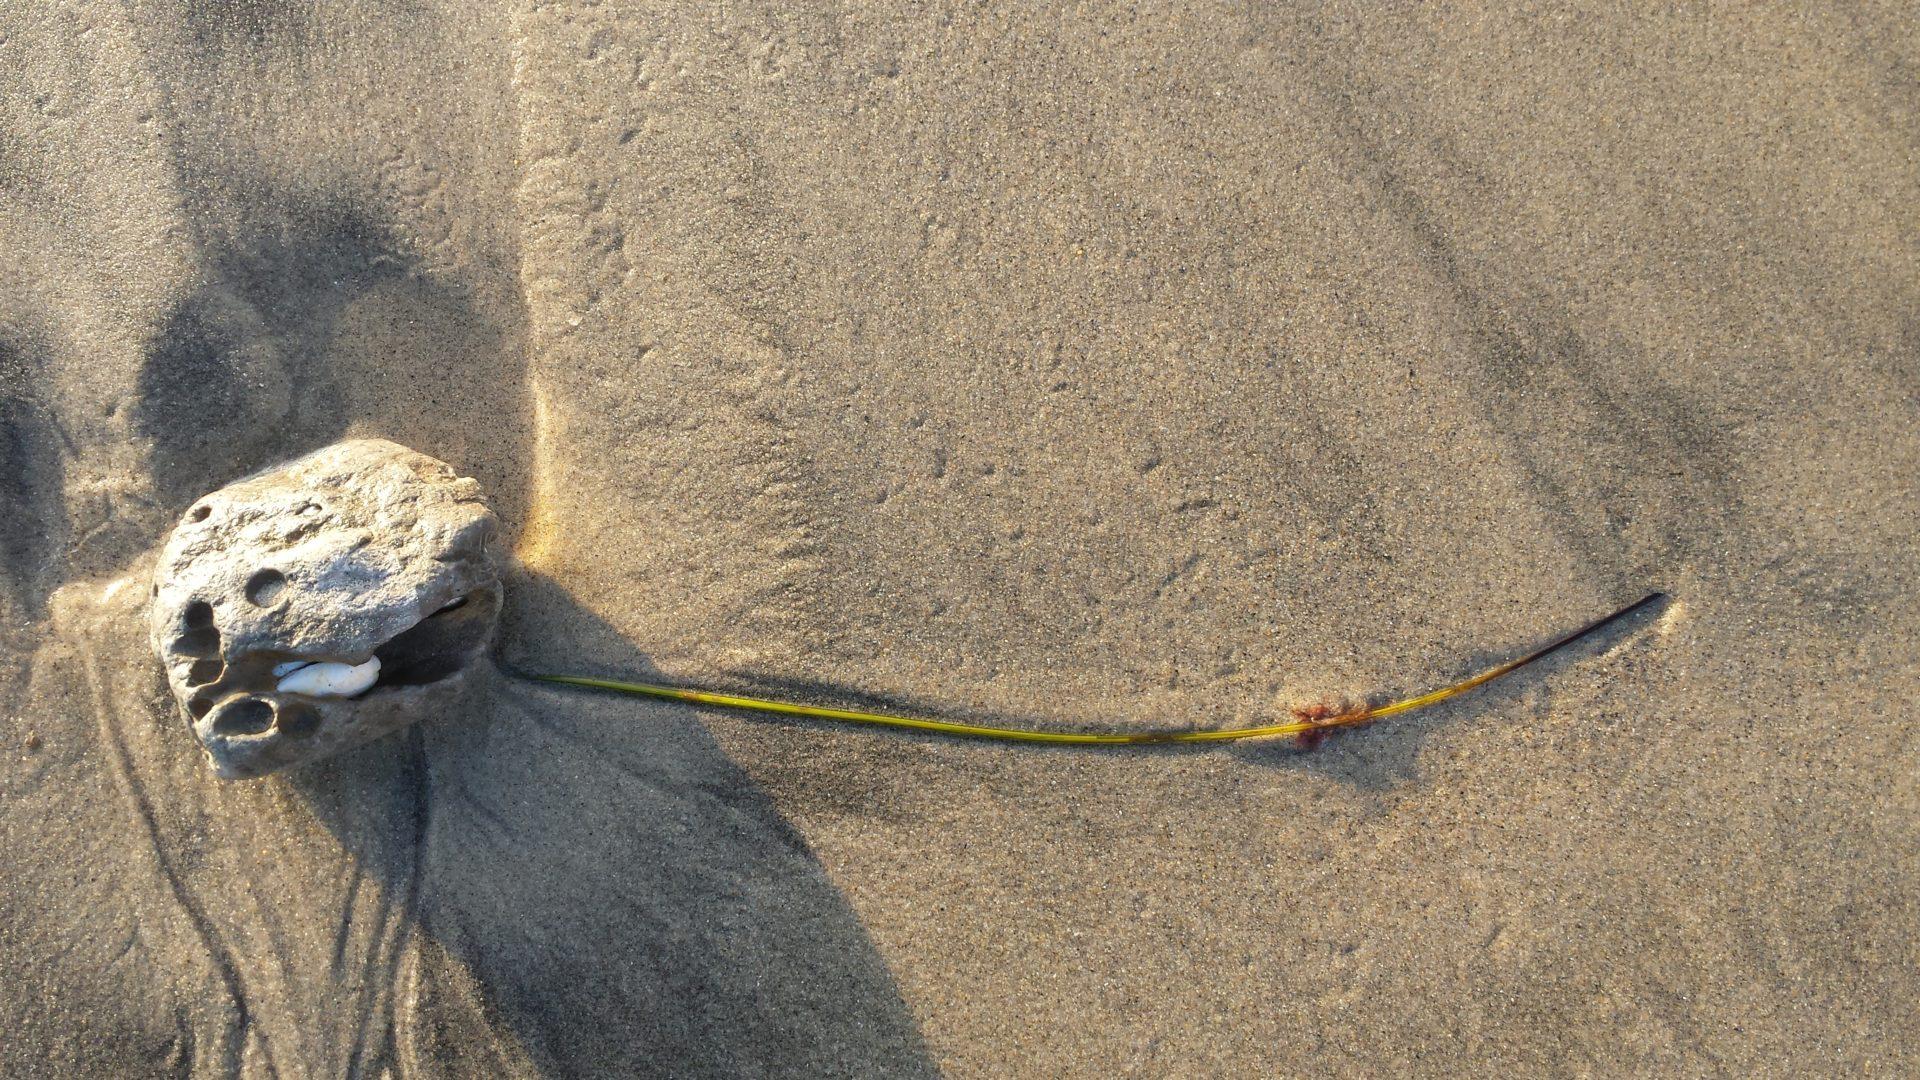 Skull/habitat/stone/shell/seagrass